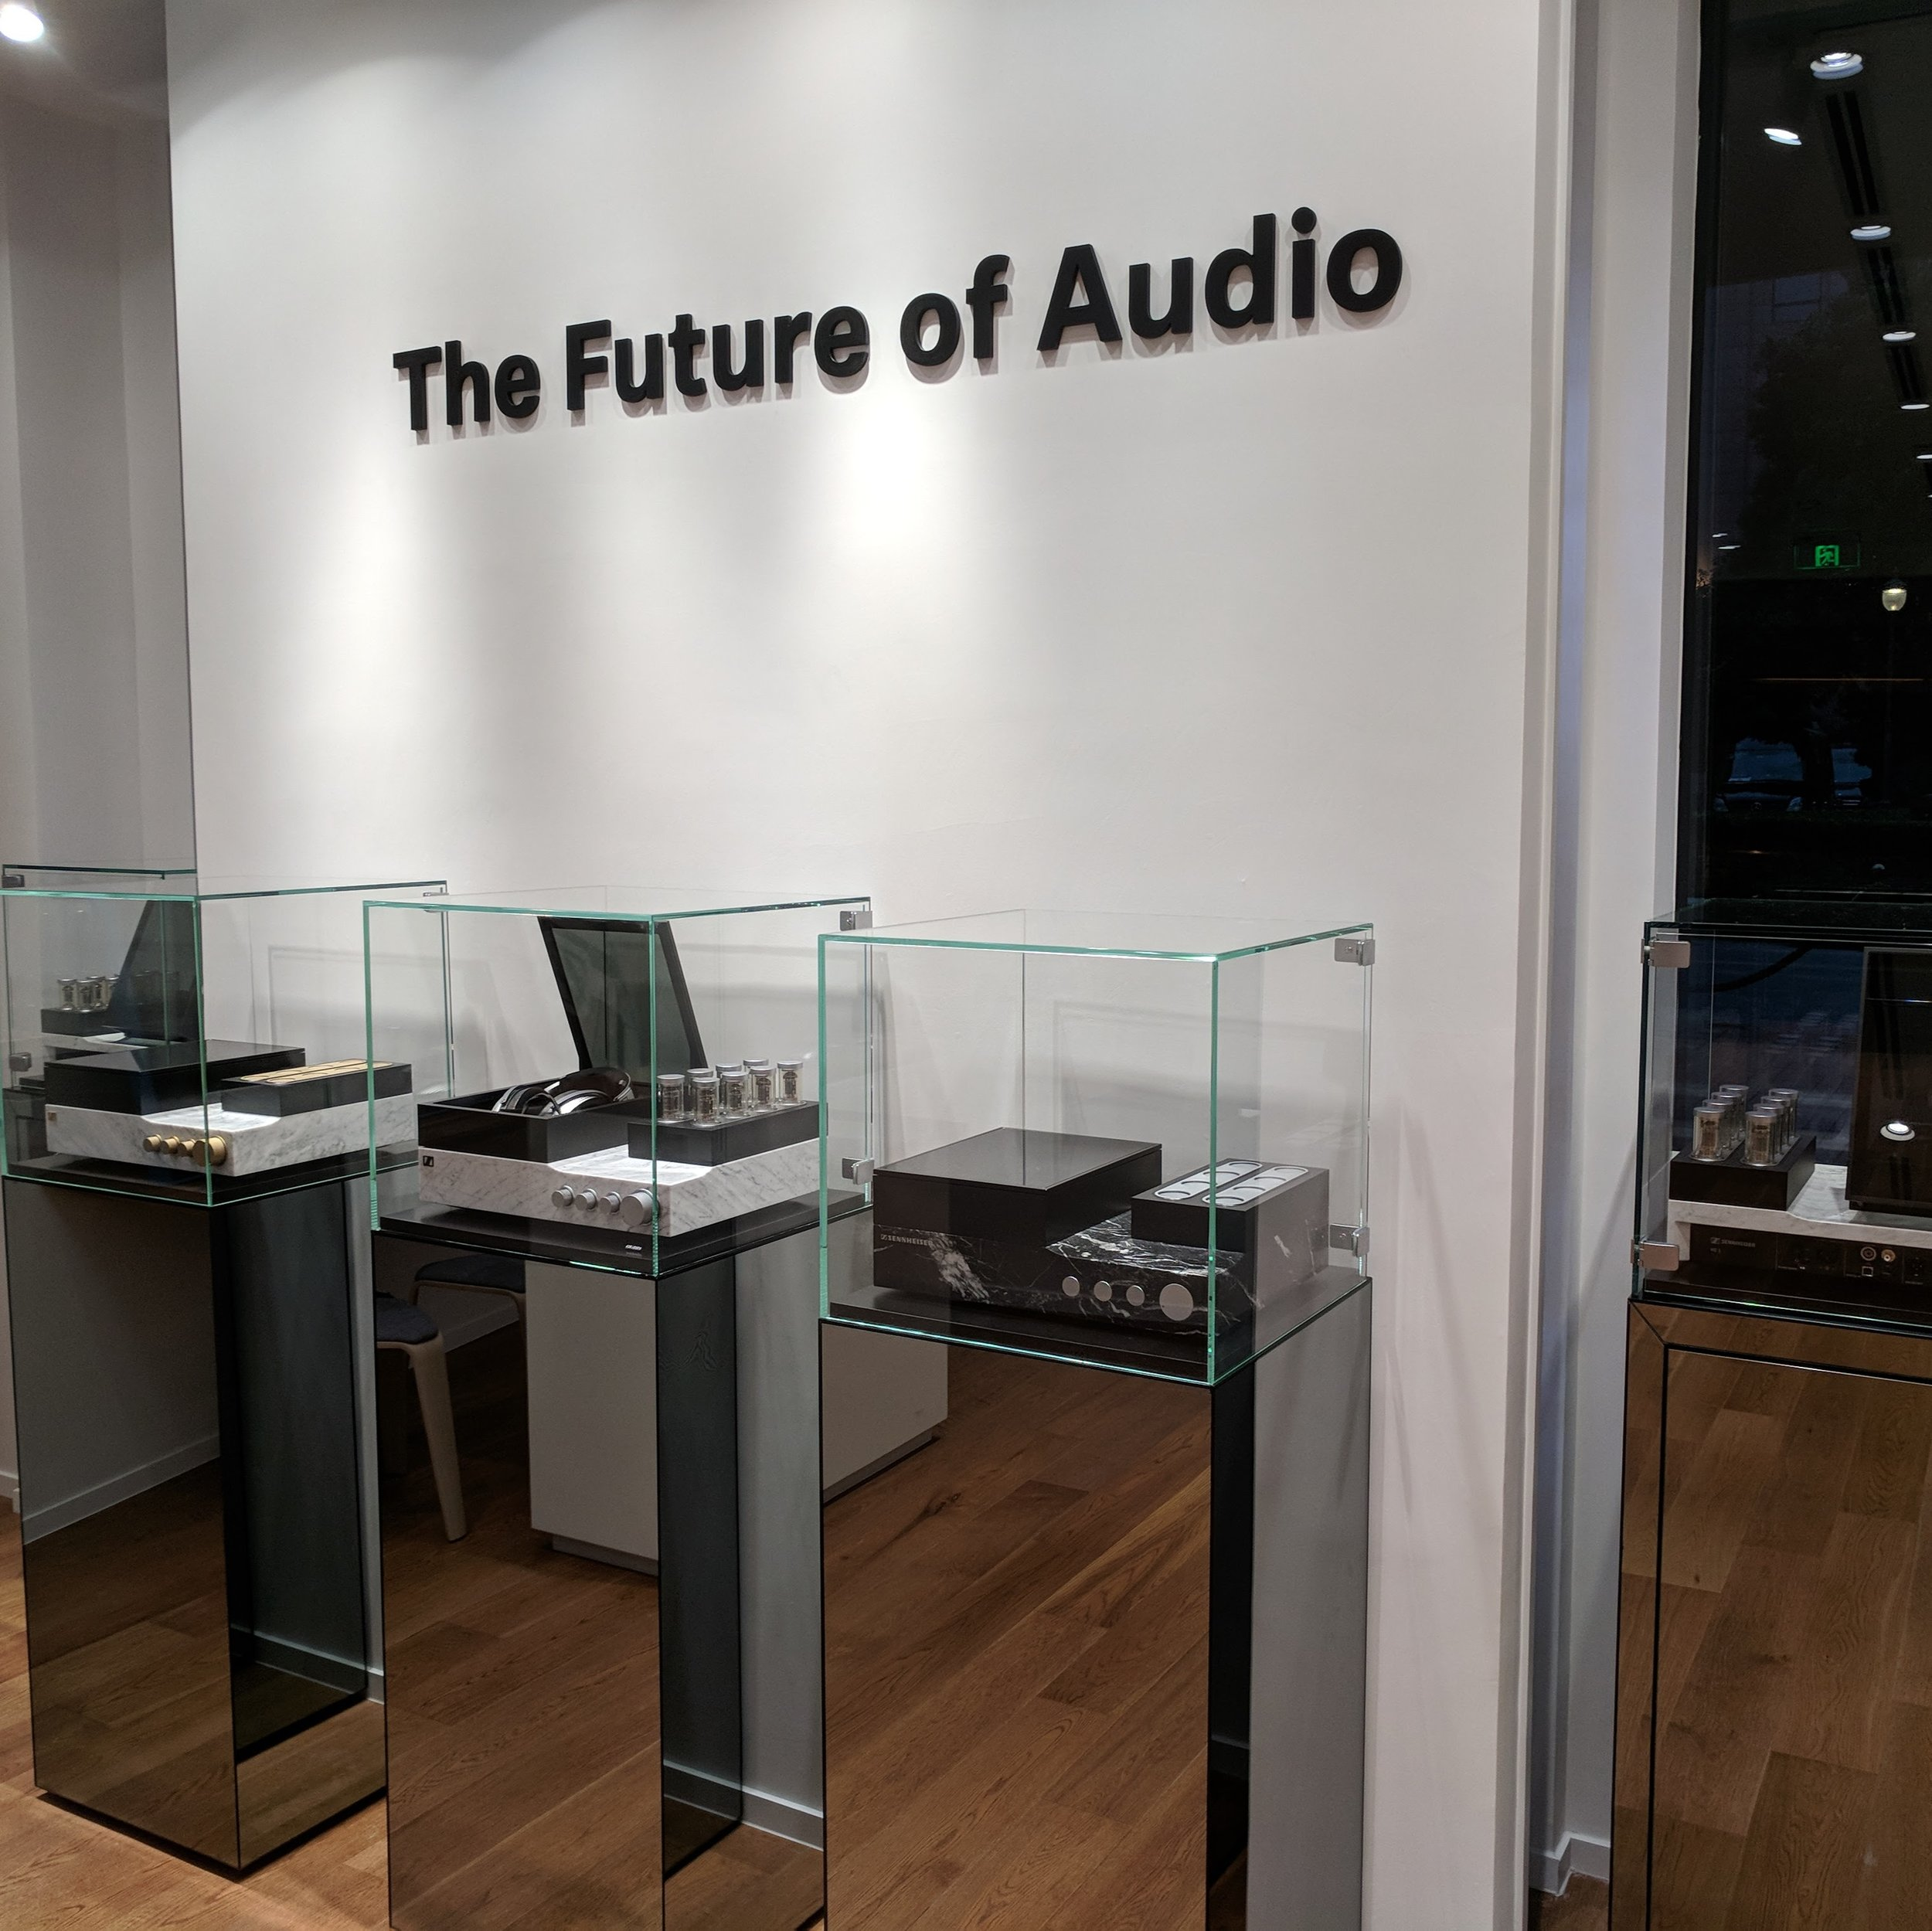 sennheiser-he-1-glass-case-the-future-of-audio.jpg